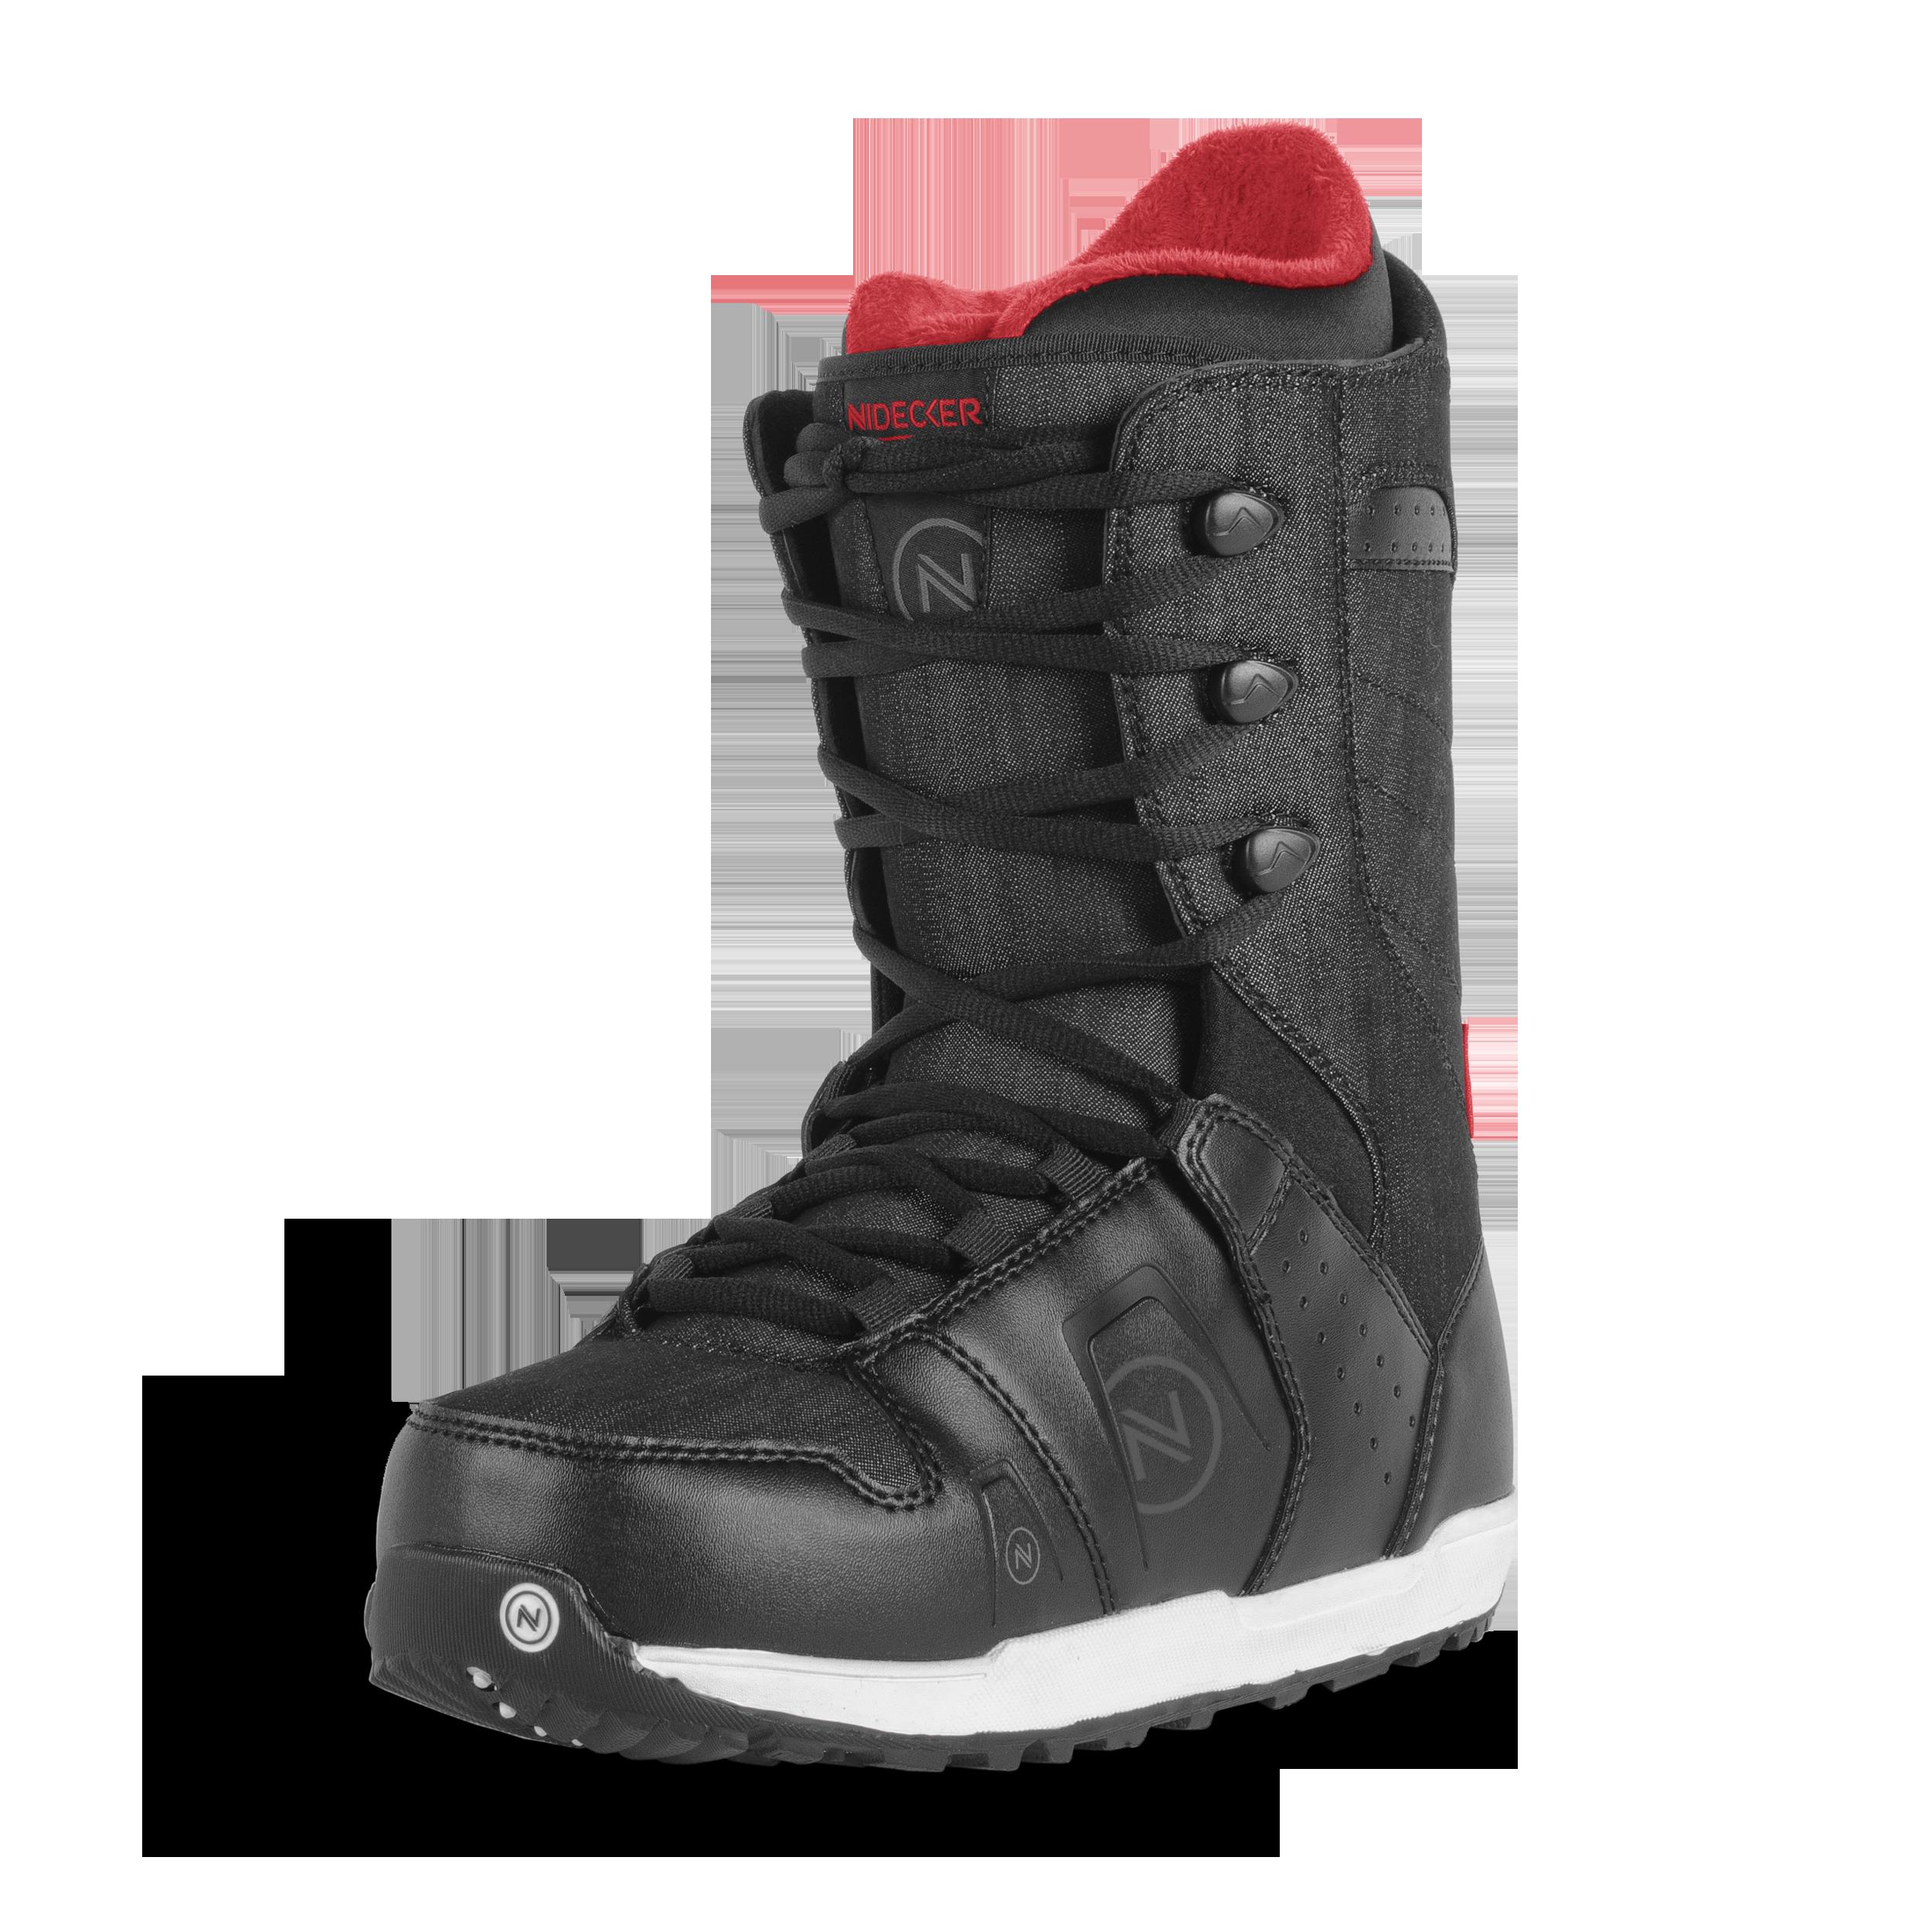 Ботинки для сноуборда NIDECKER 2017-18 CHARGER LACE BLACK 6e2705c732b